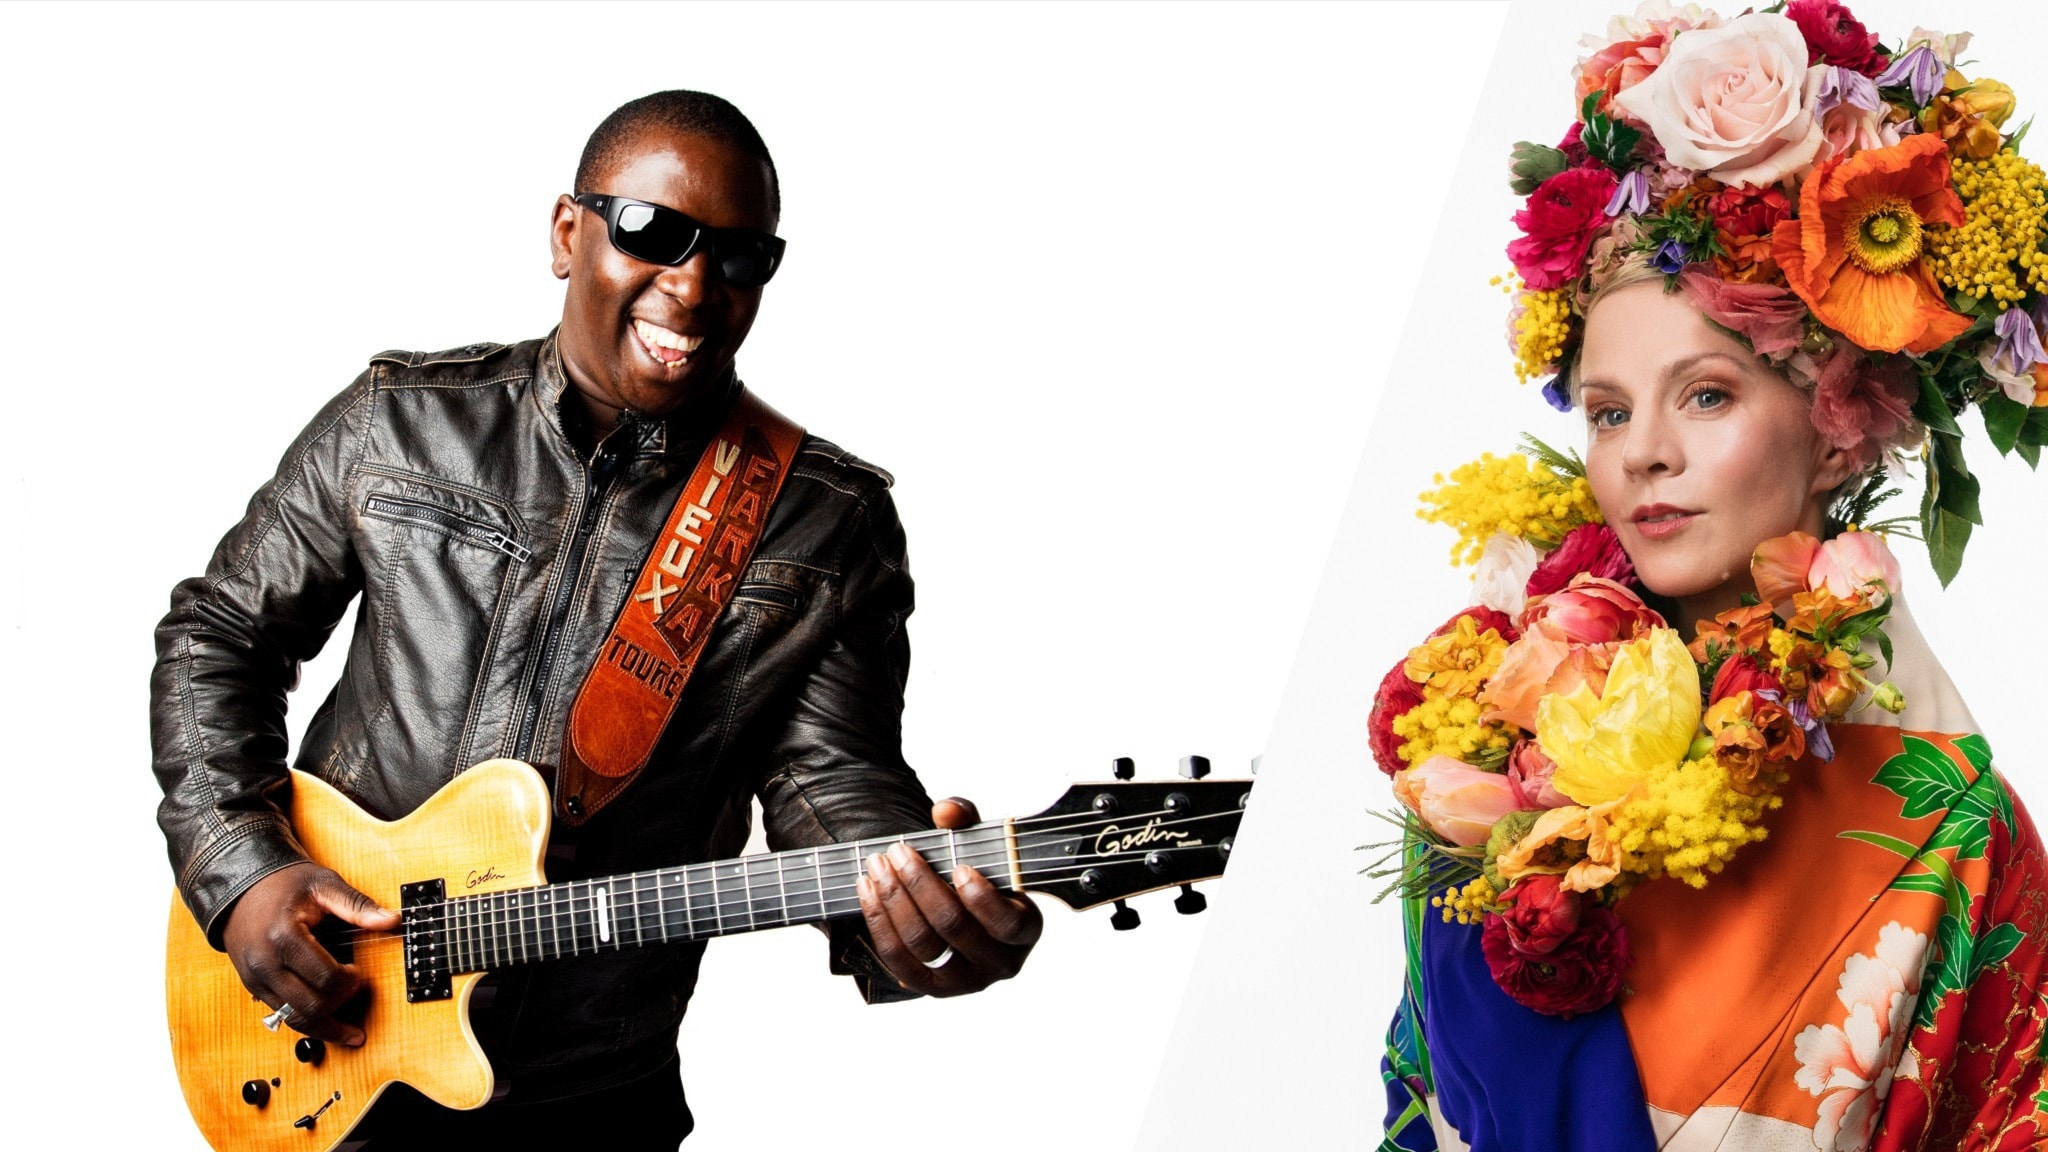 Artisten Vieux Farka Touré och programledaren Esmeralda Moberg